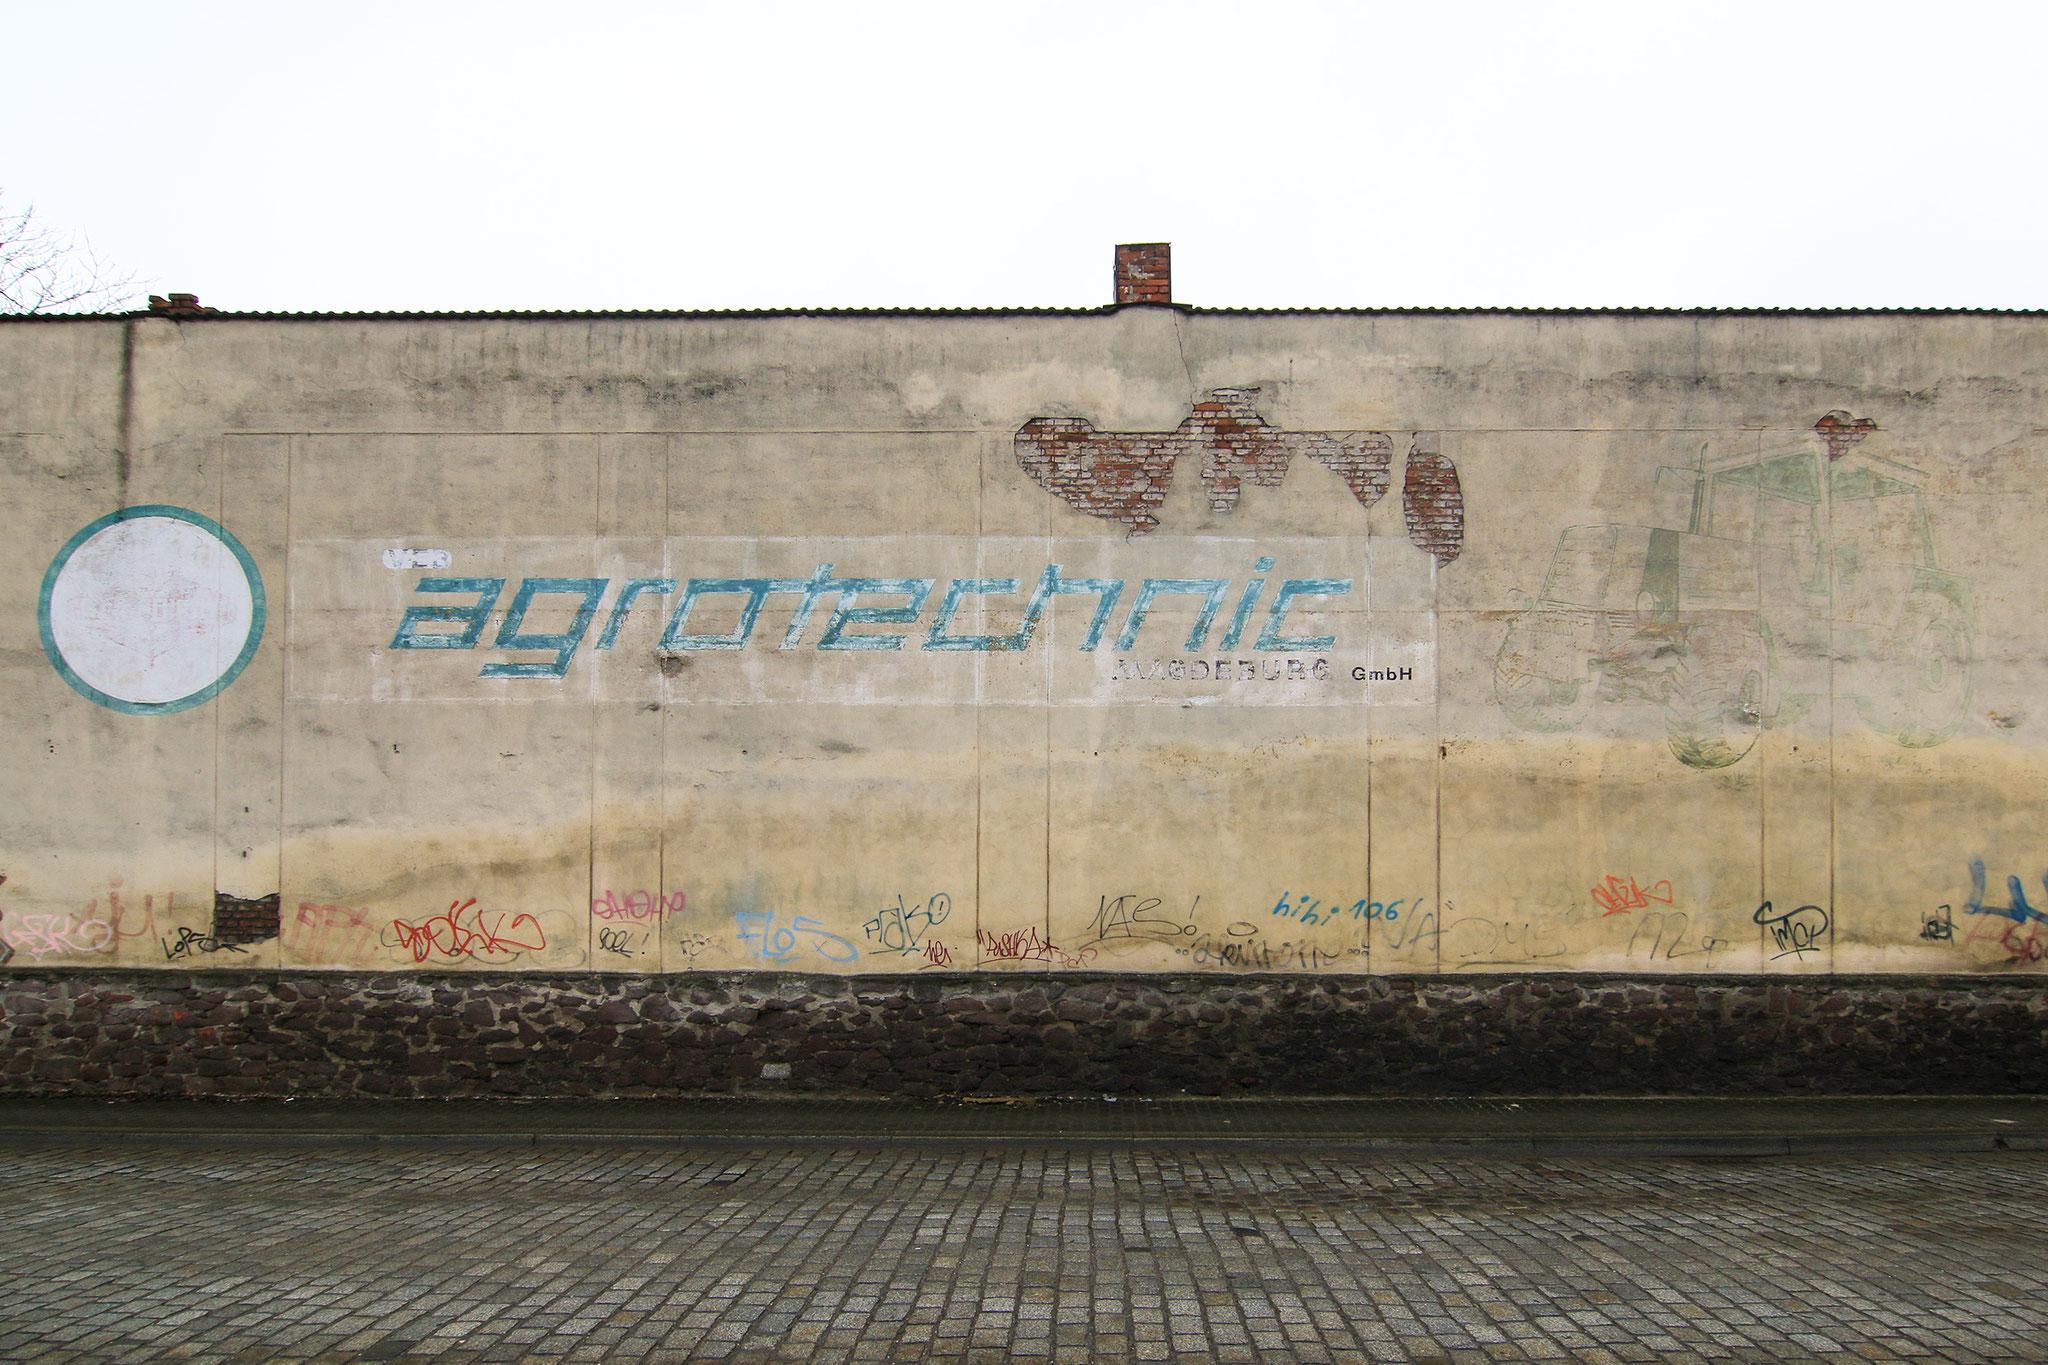 VEB Agrotechnic Magdeburg